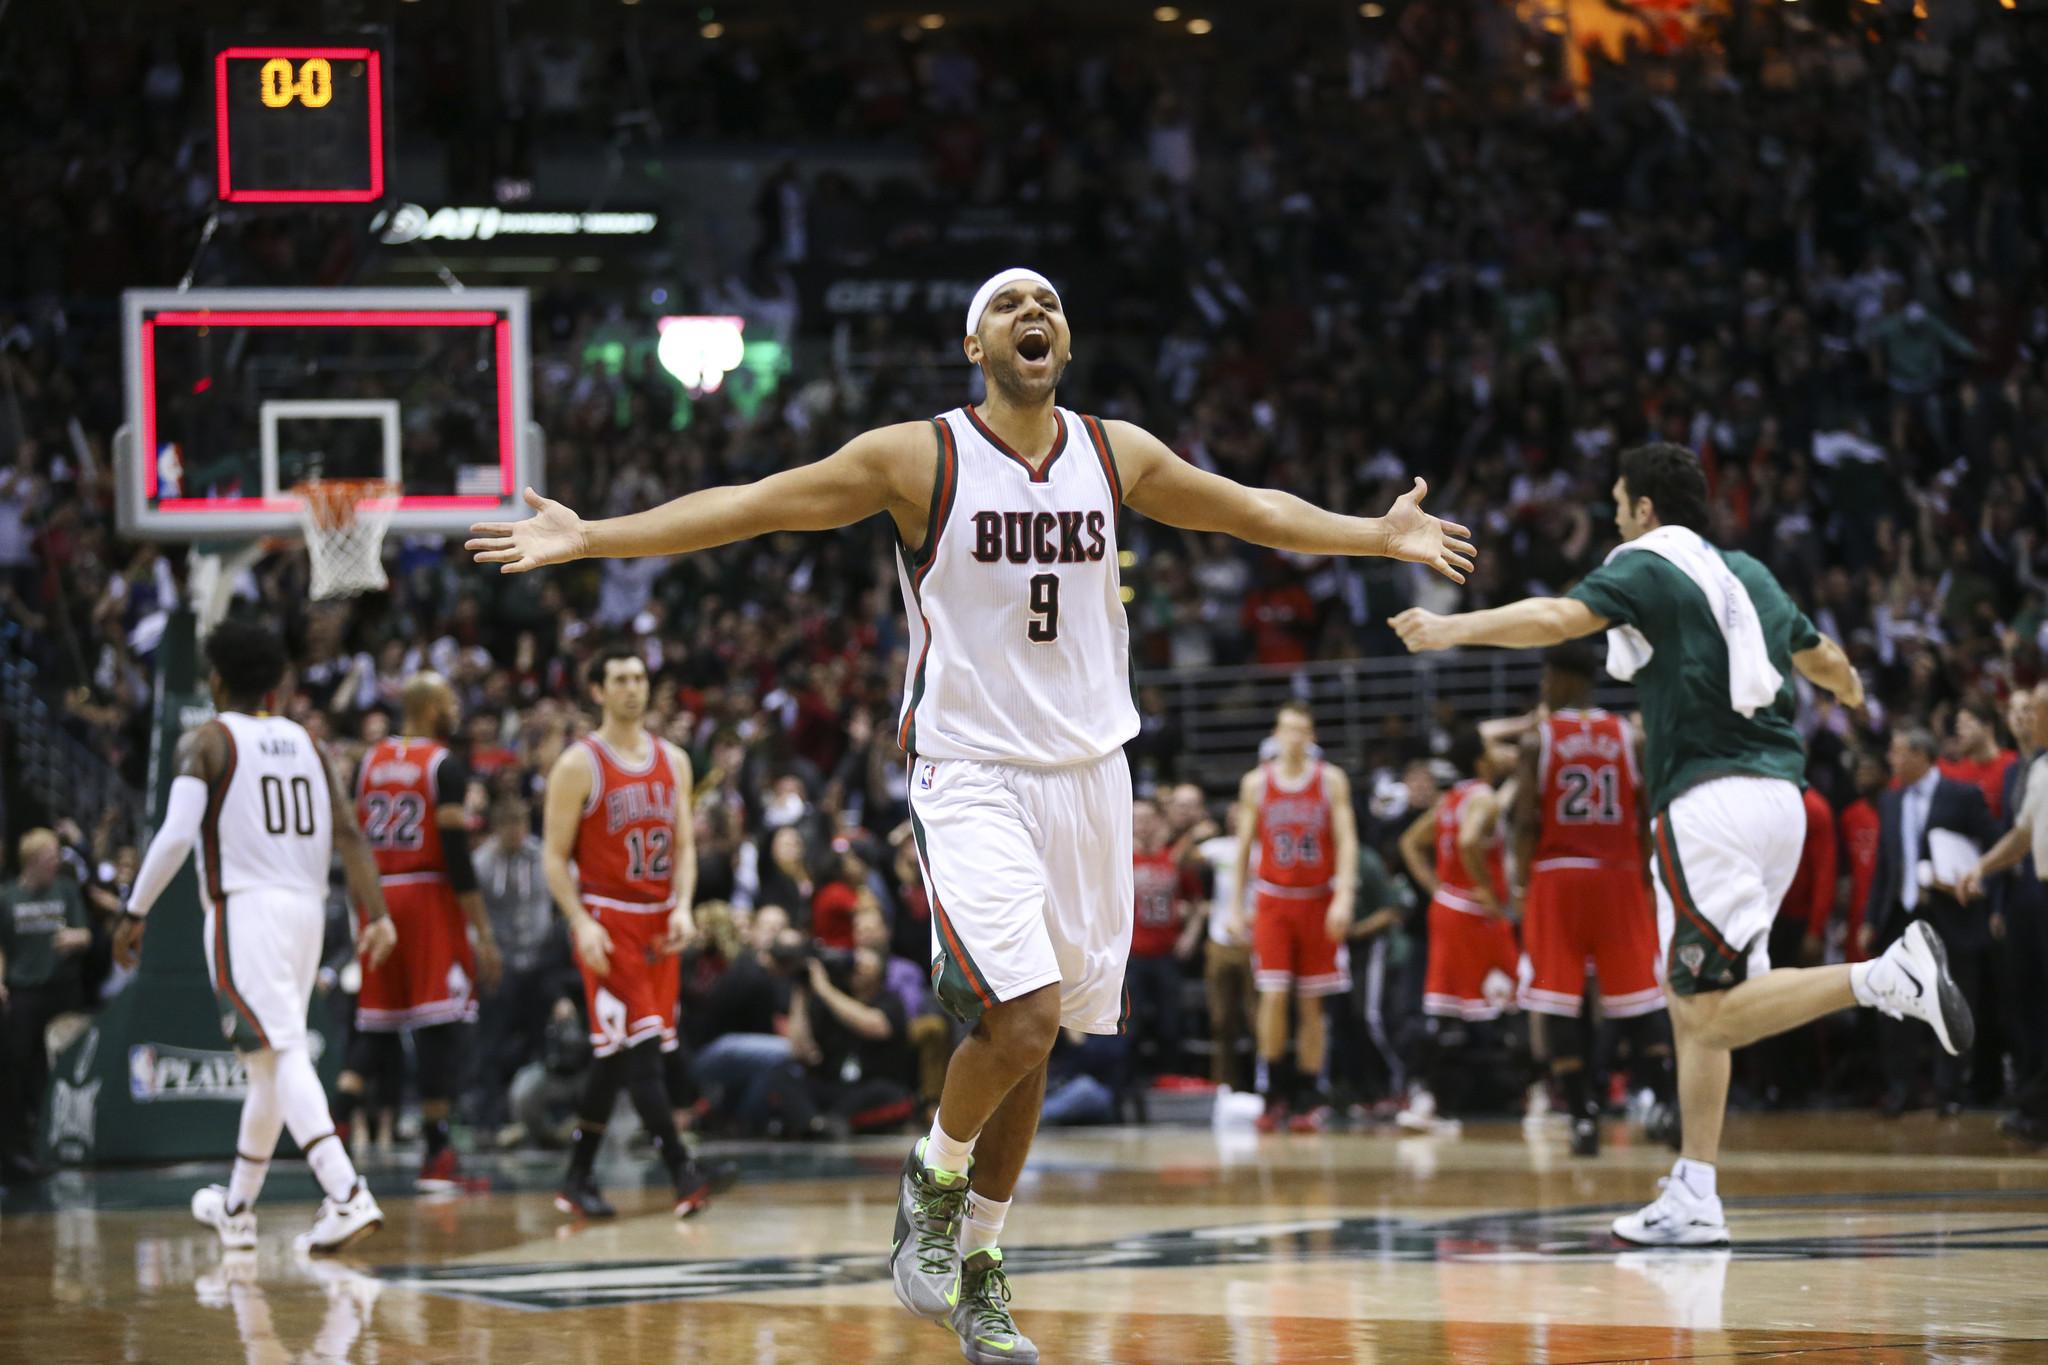 Perfect Inbounds Play Helps Bucks Beat Bulls At Buzzer